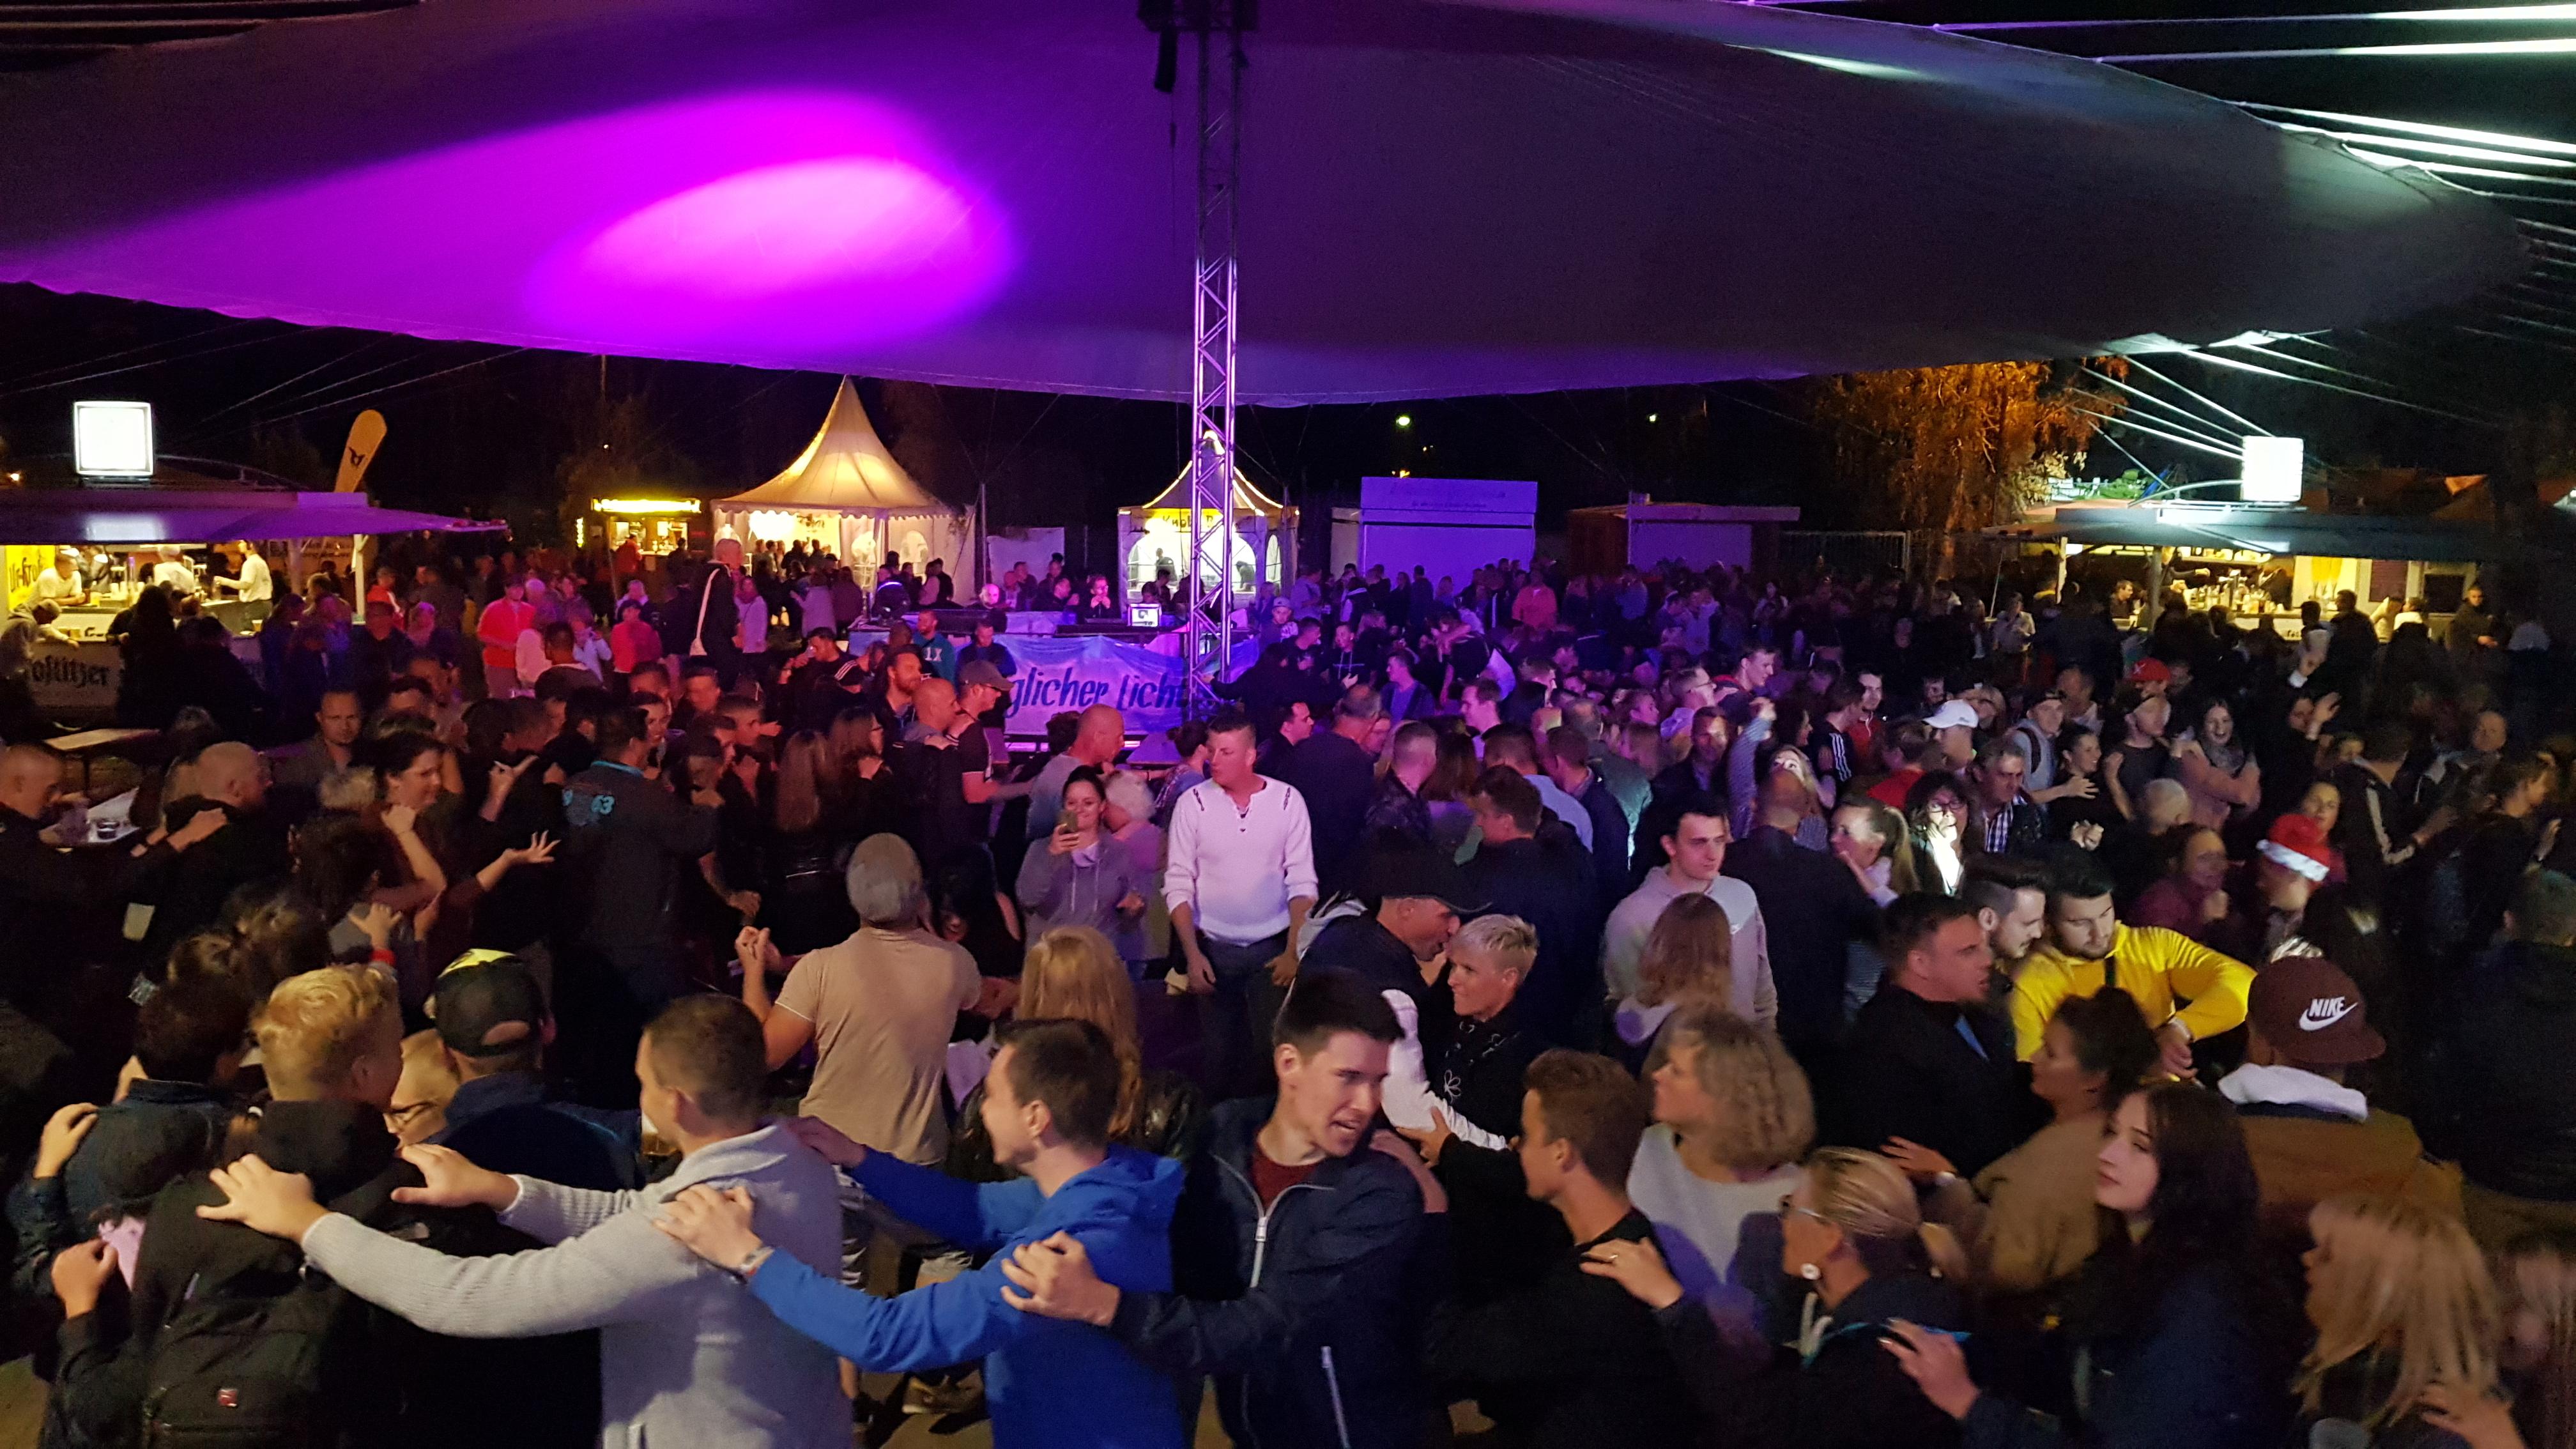 DJ - Stadfest Taucha - Tauchsche